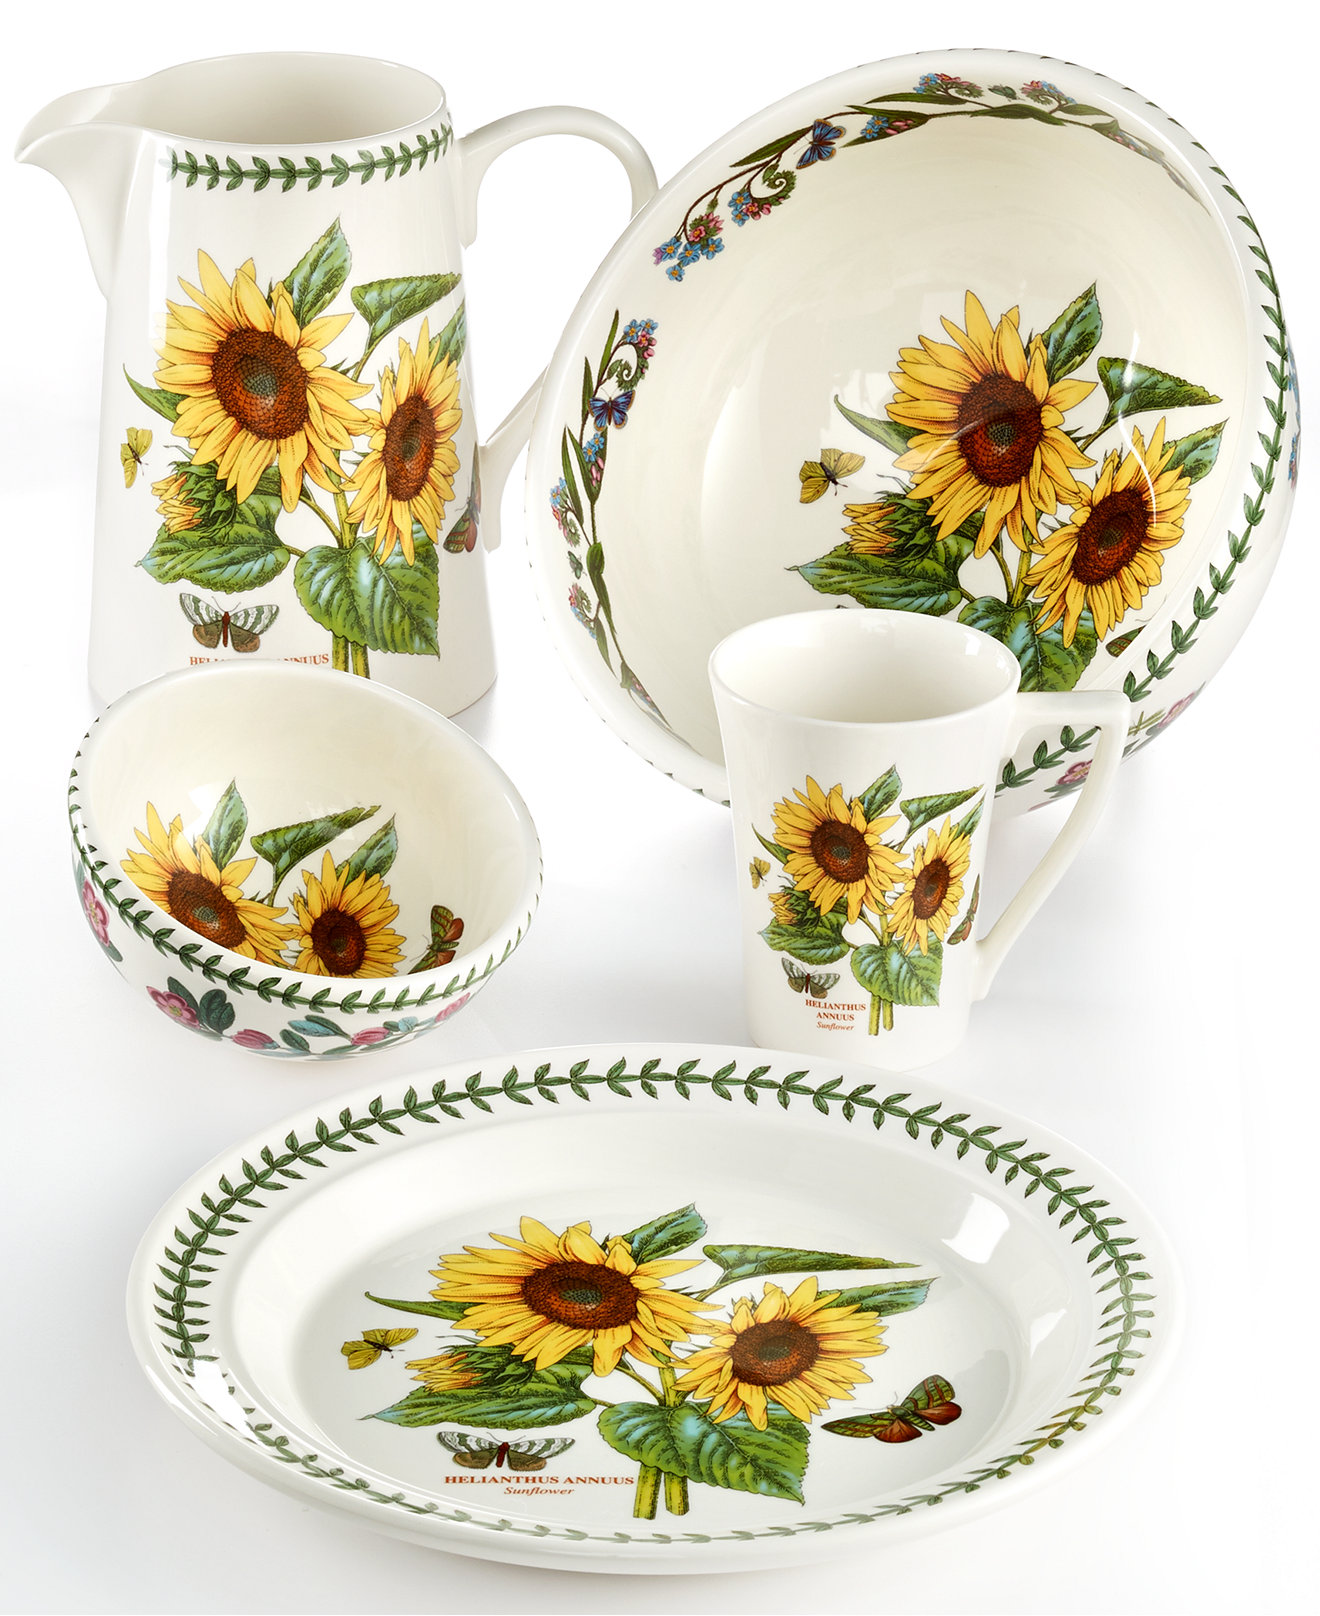 Portmeirion botanic garden 16 piece dinnerware set for Portmeirion dinnerware set of 4 botanic garden canape plates